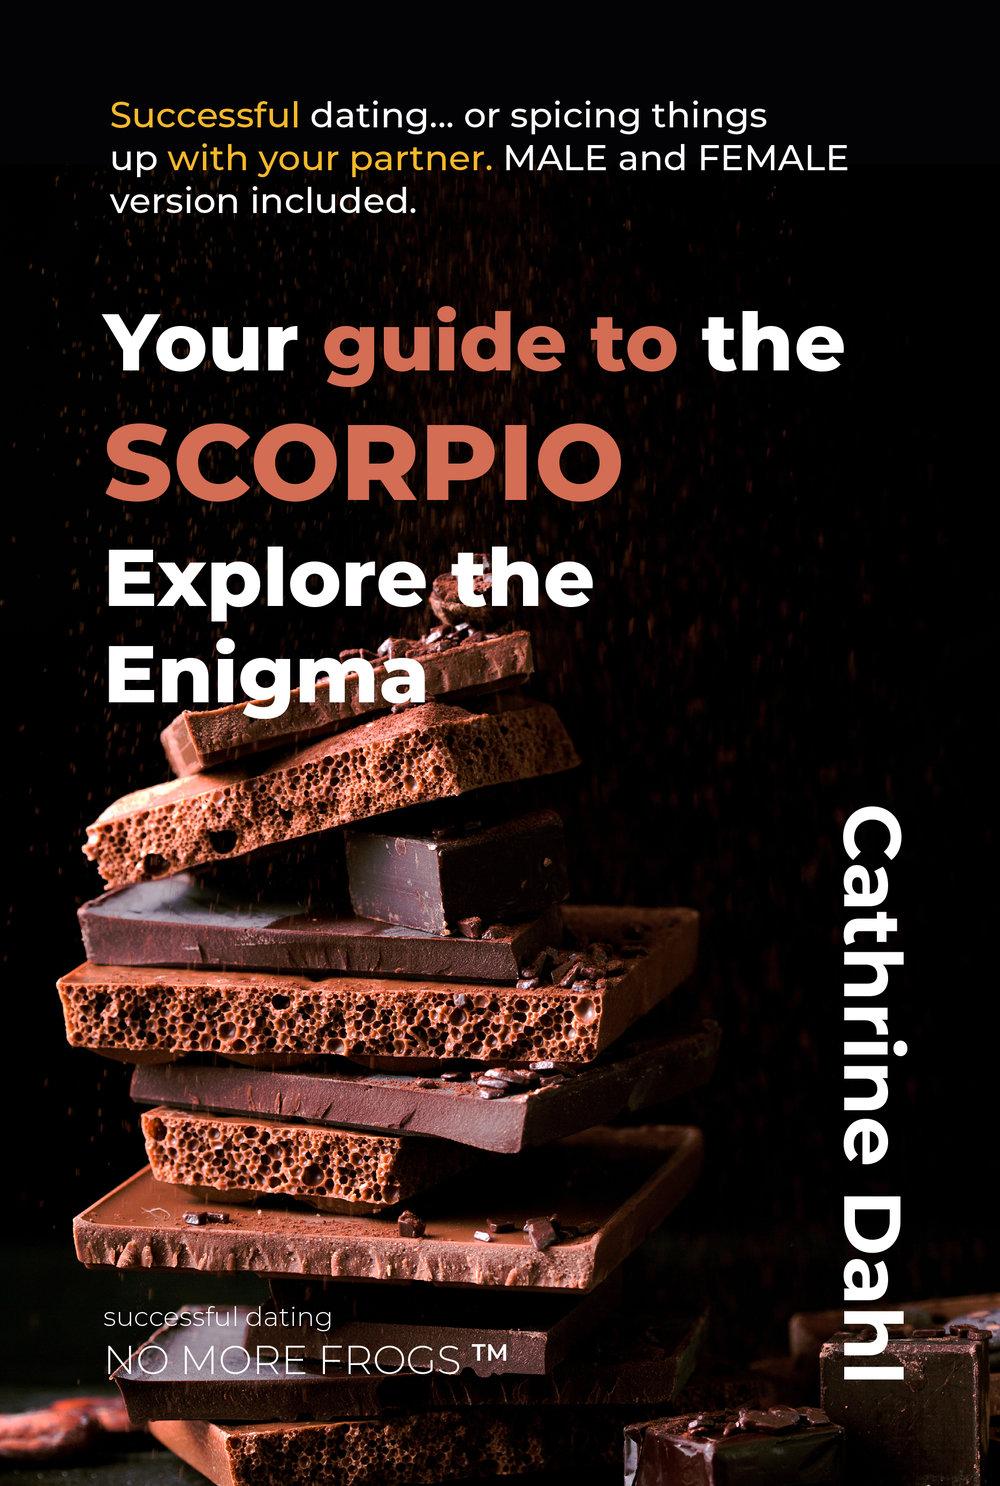 08_scorpio_ebook_cover_190126.jpg